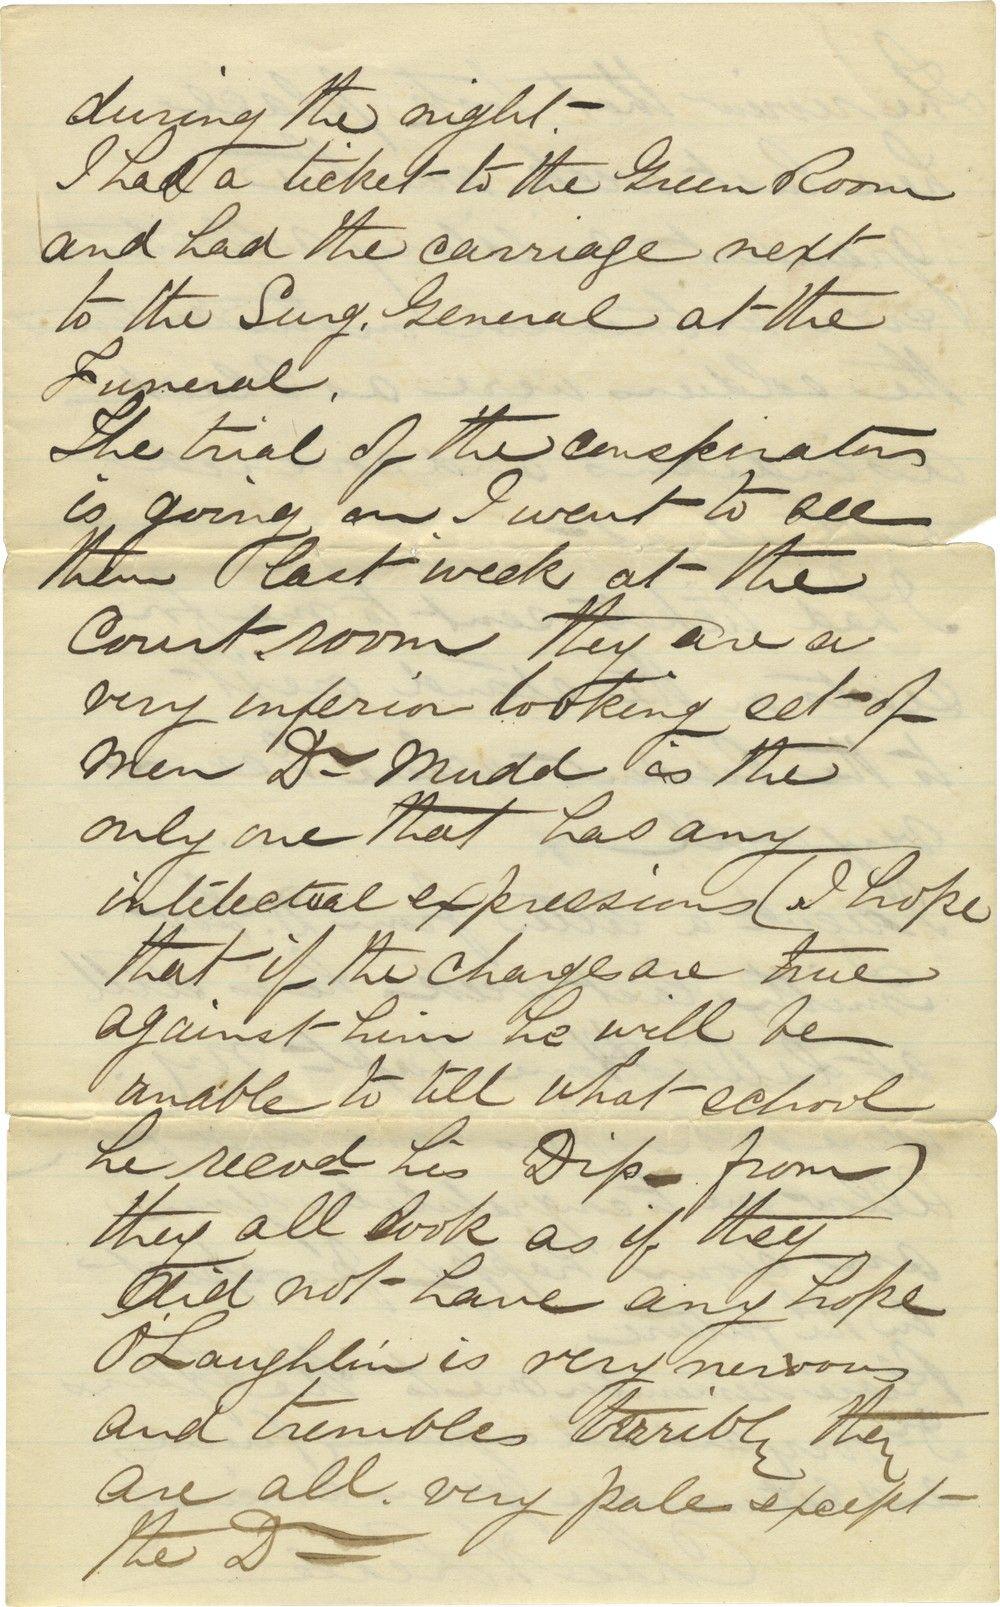 Page 7 transcript